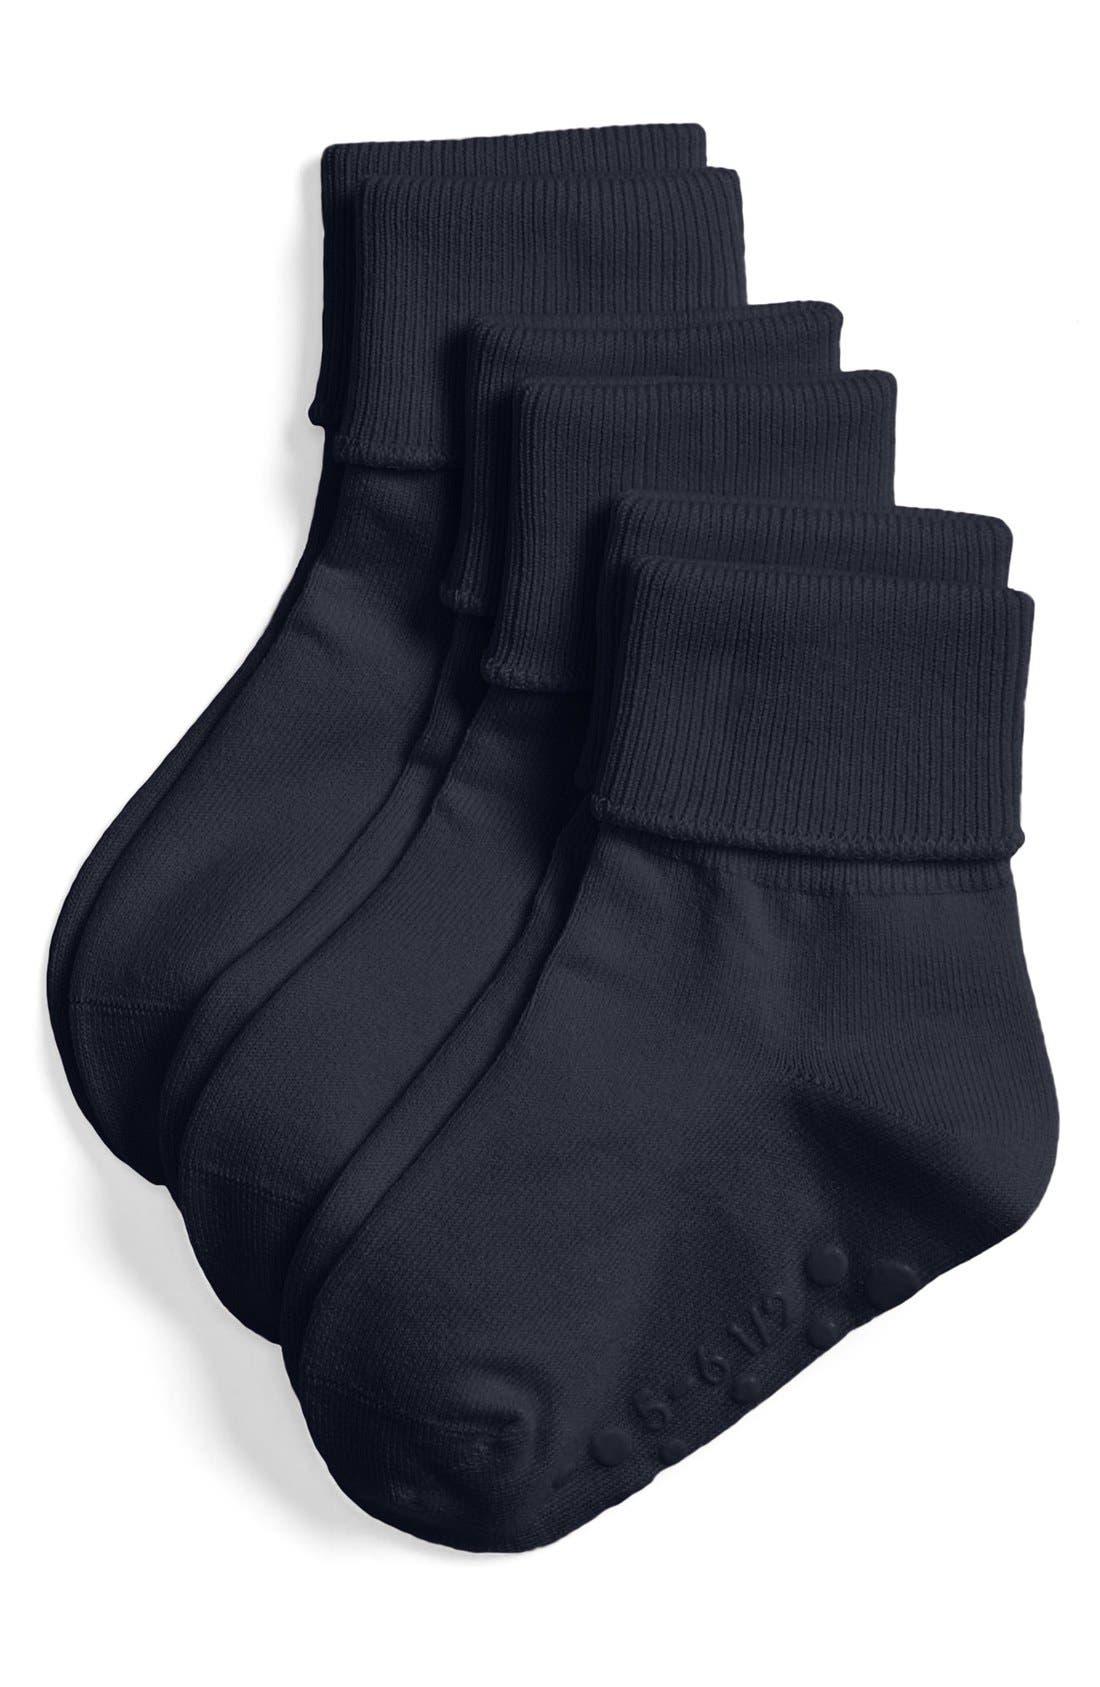 Main Image - Tucker + Tate Cotton Blend Socks (3-Pack) (Baby Girls, Toddler Girls, Little Girls & Big Girls)